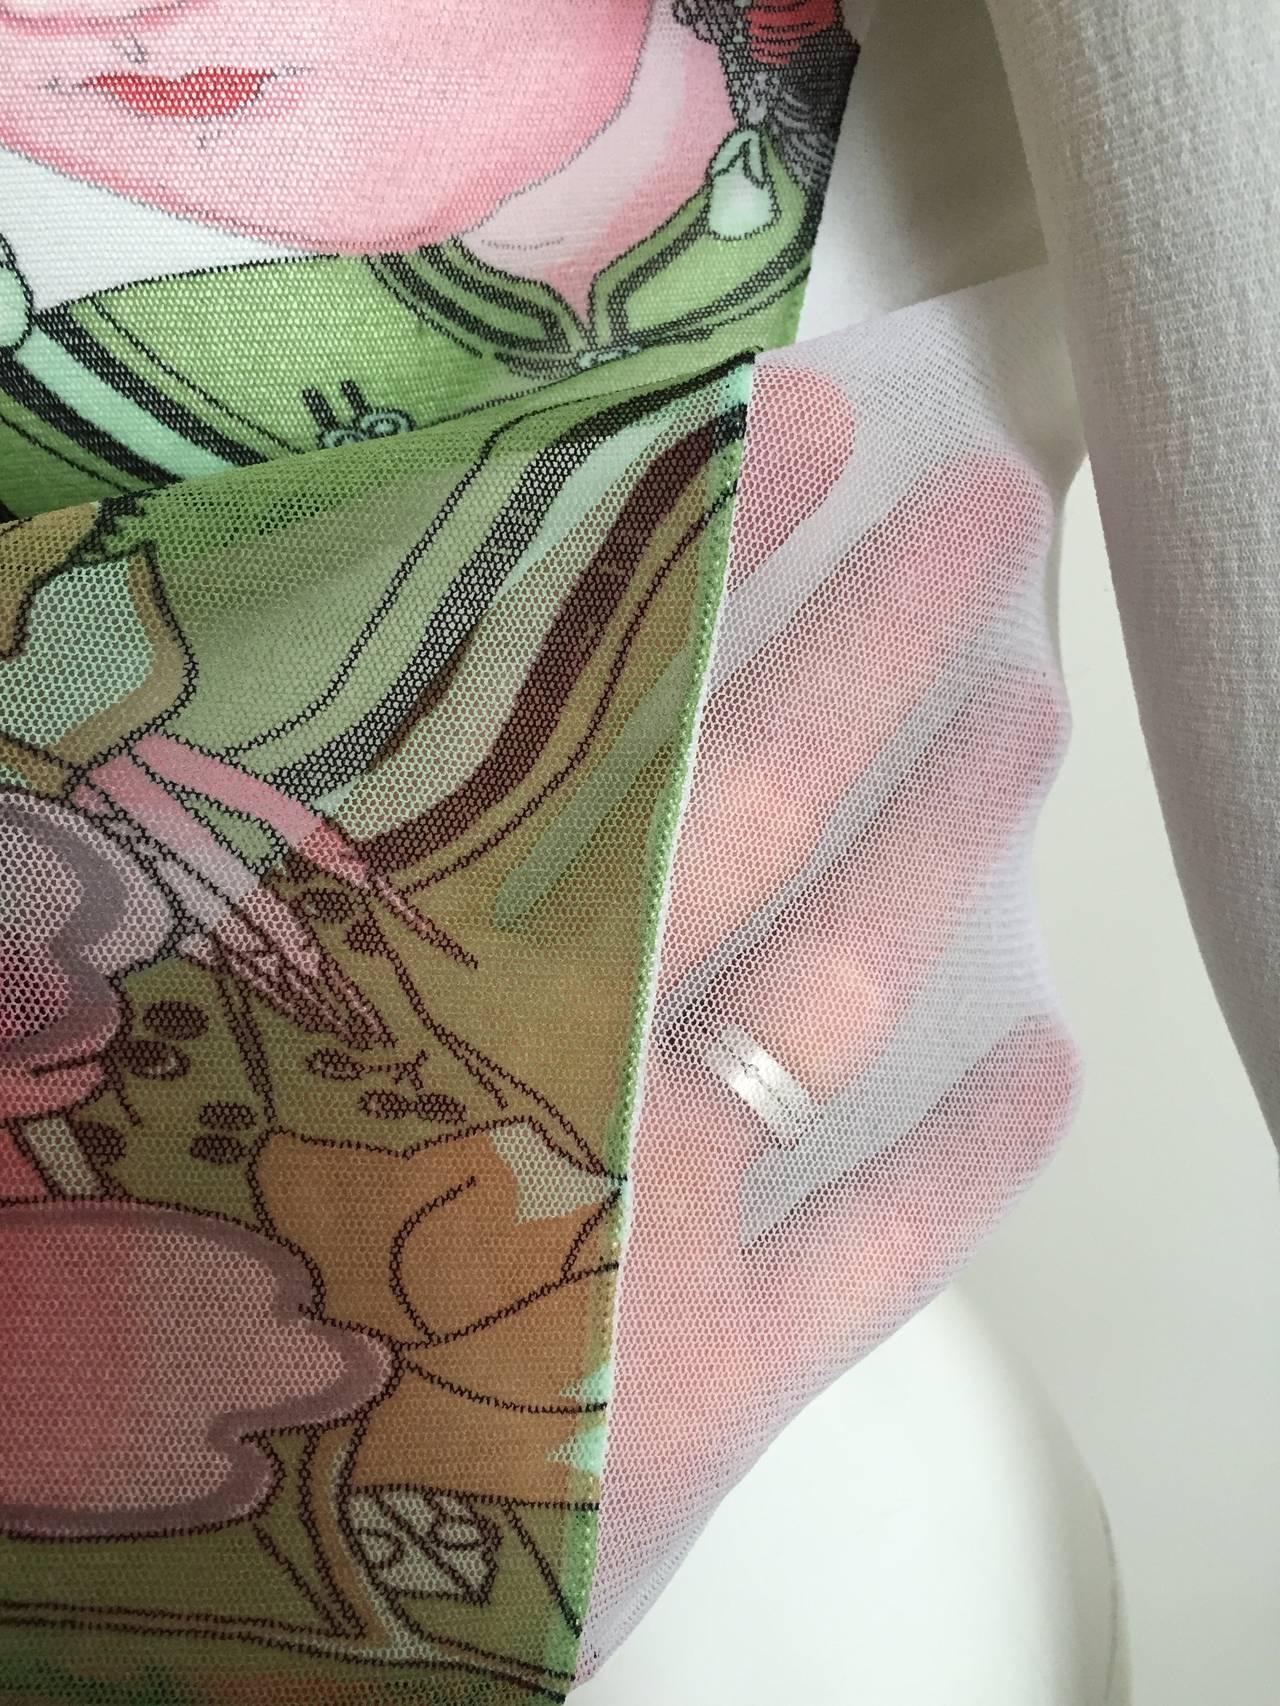 Kenzo Jungle Asian Sheer Long Sleeve Top Size Small. 9